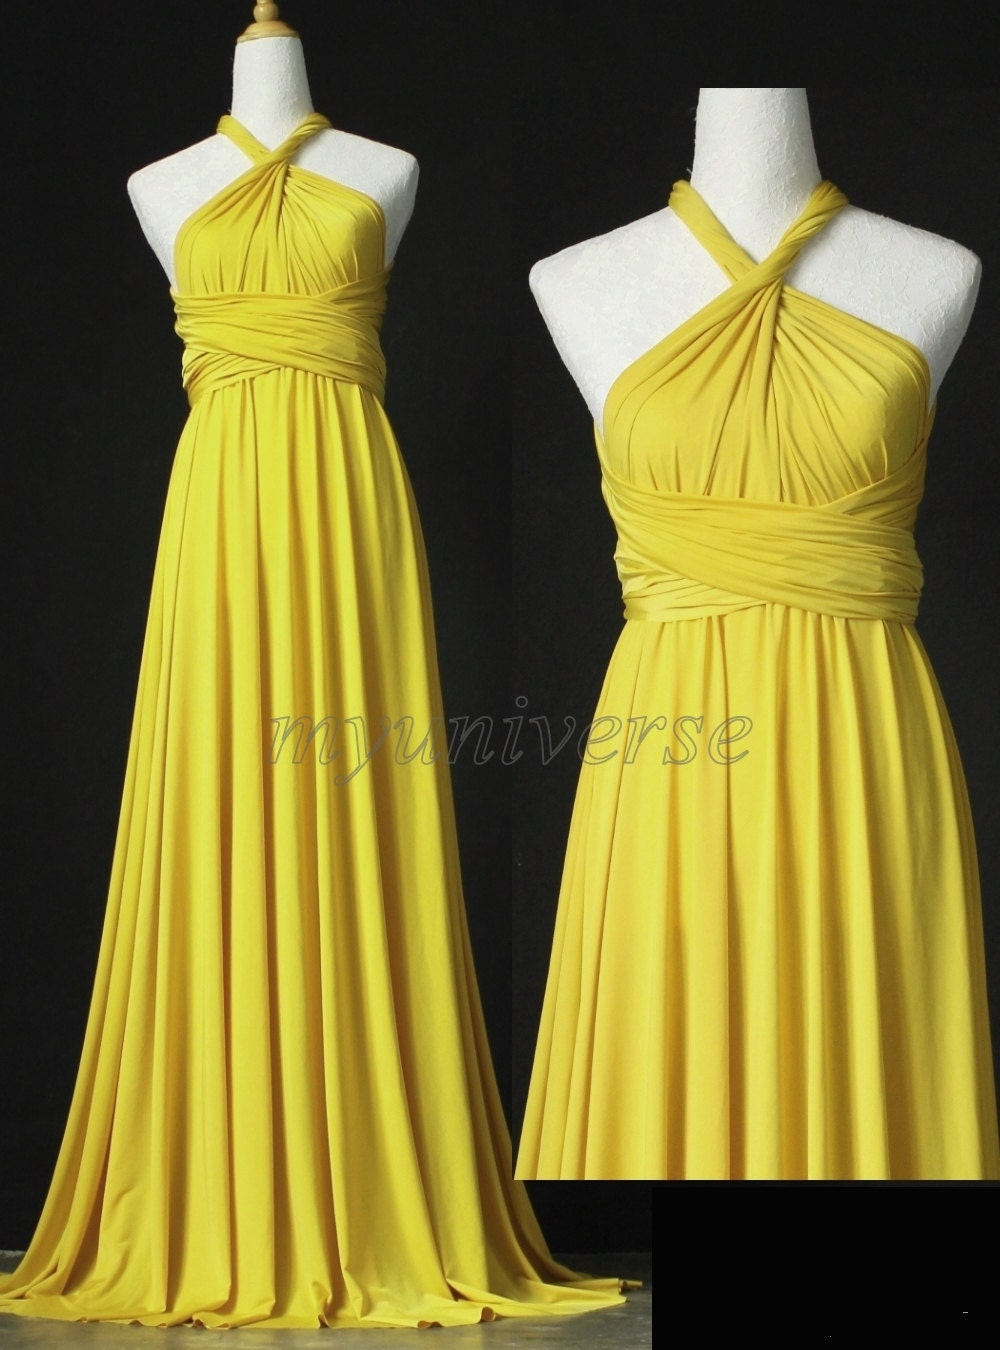 Bridesmaid Dress Yellow Daffodil We dding Dress Wrap Gown Dress